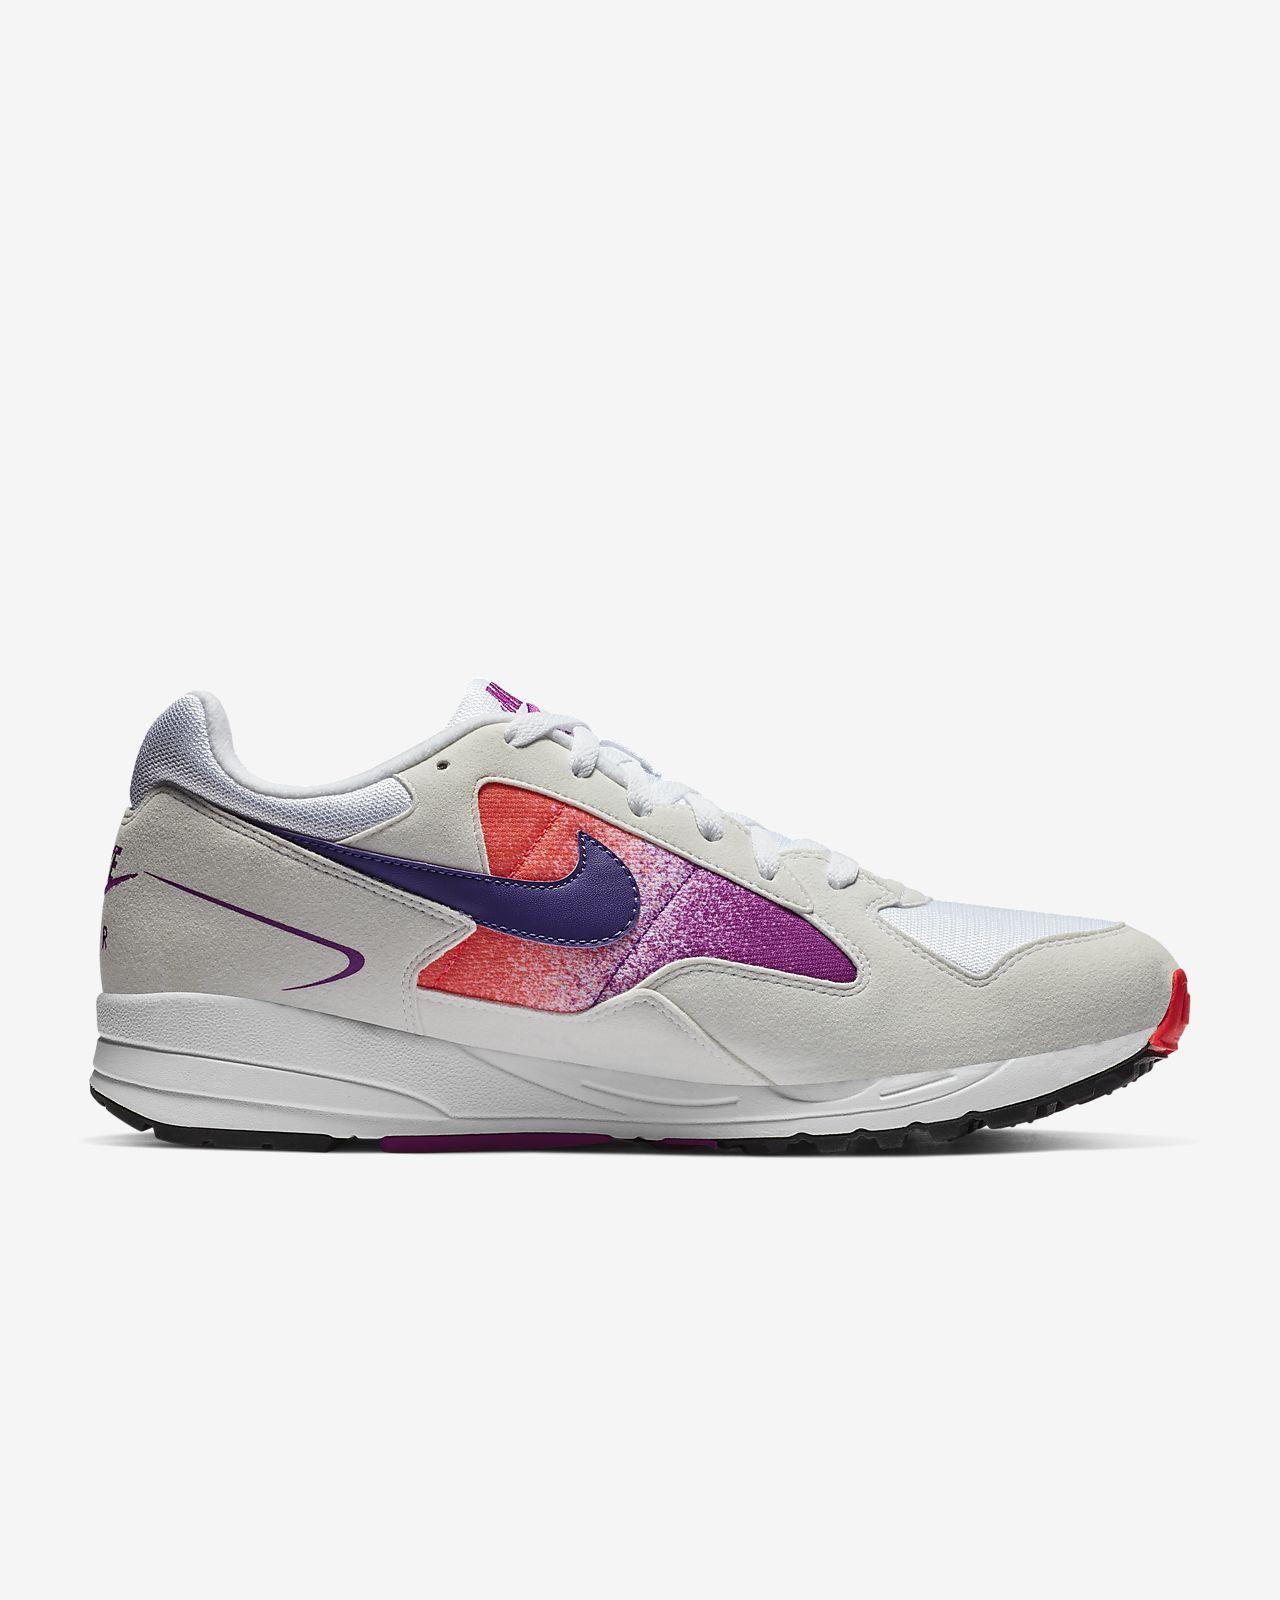 new product 592c0 c8c13 ... Nike Air Skylon II Men s Shoe